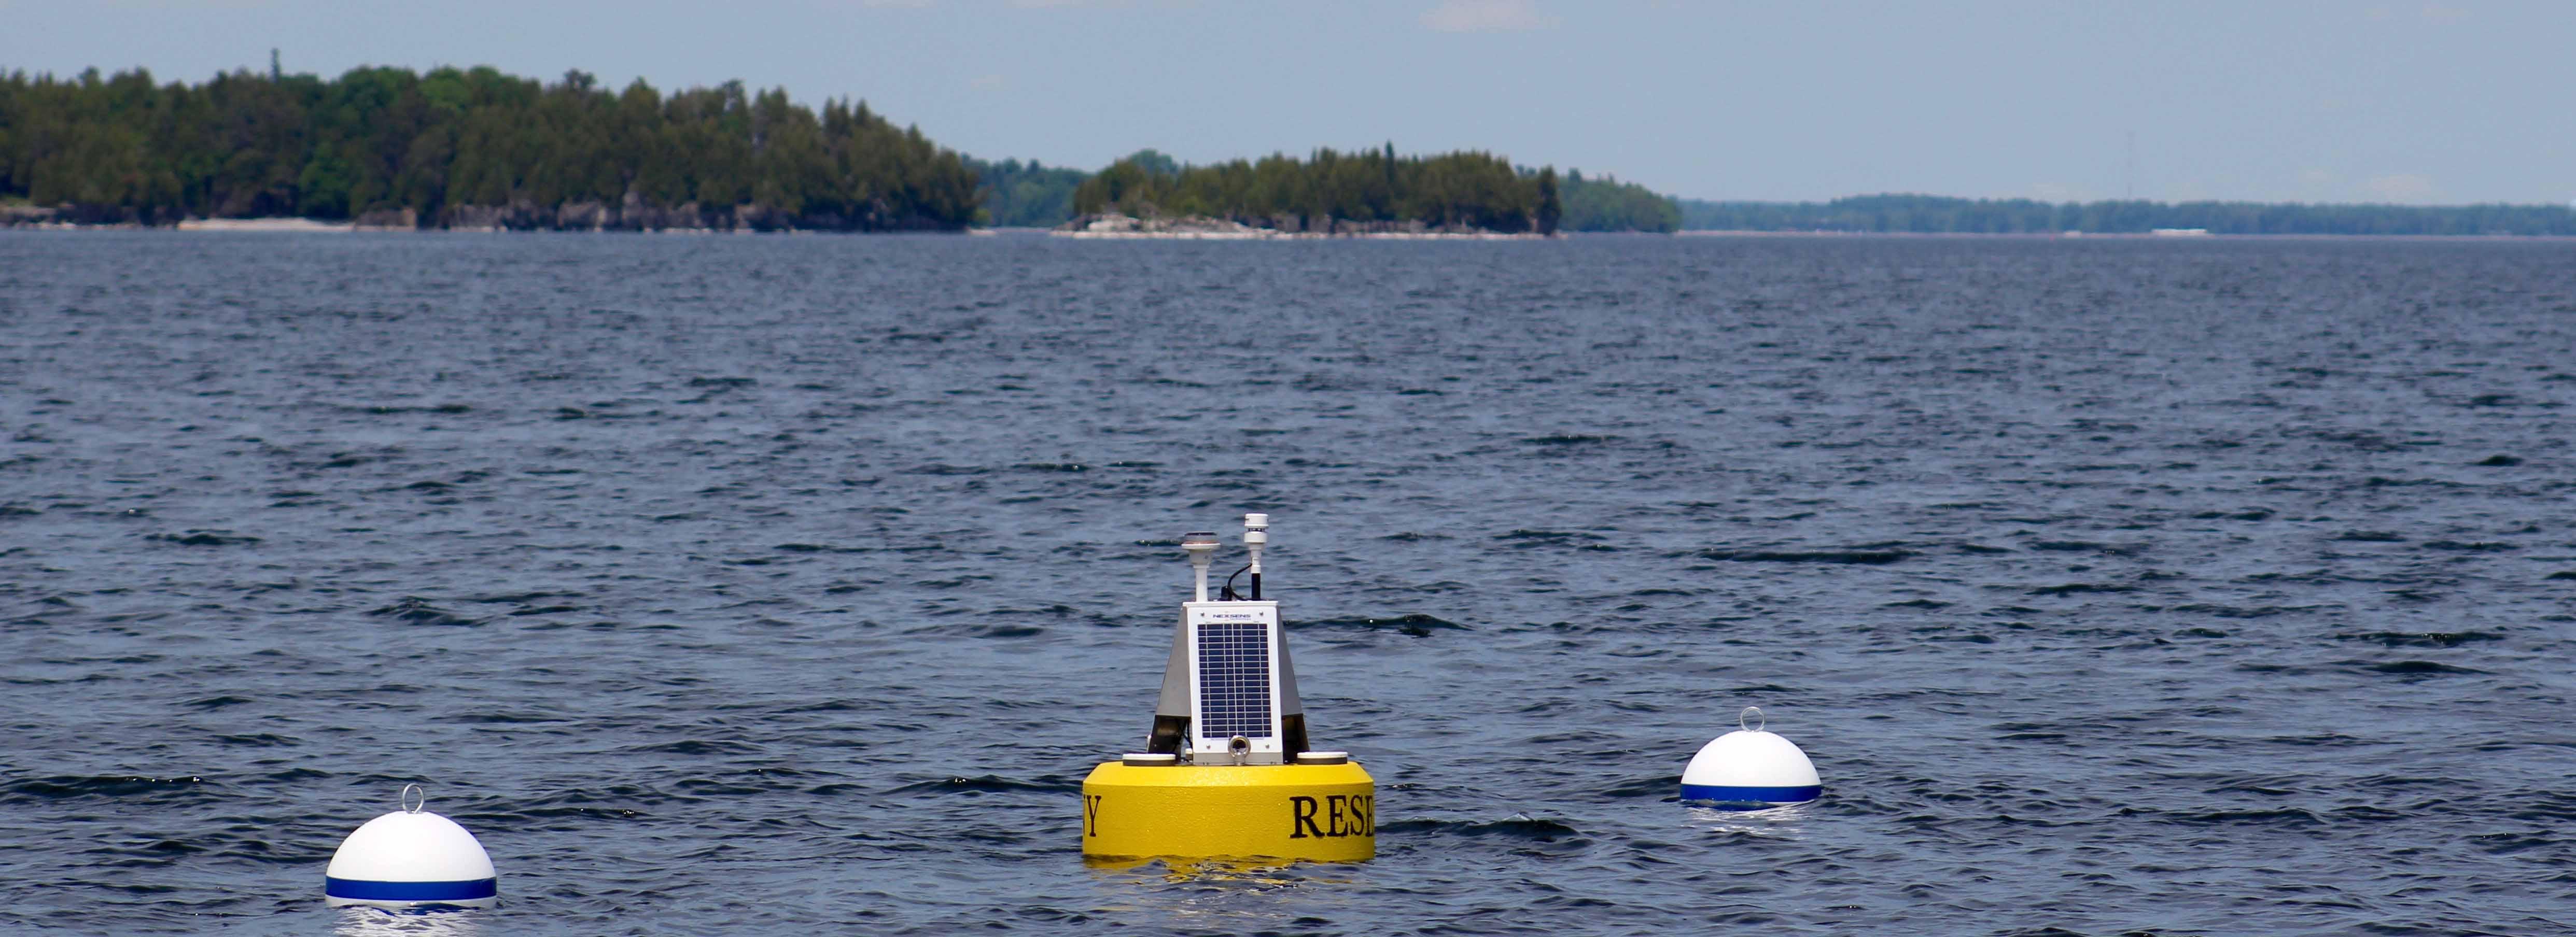 suny plattsburgh lake champlain data buoy